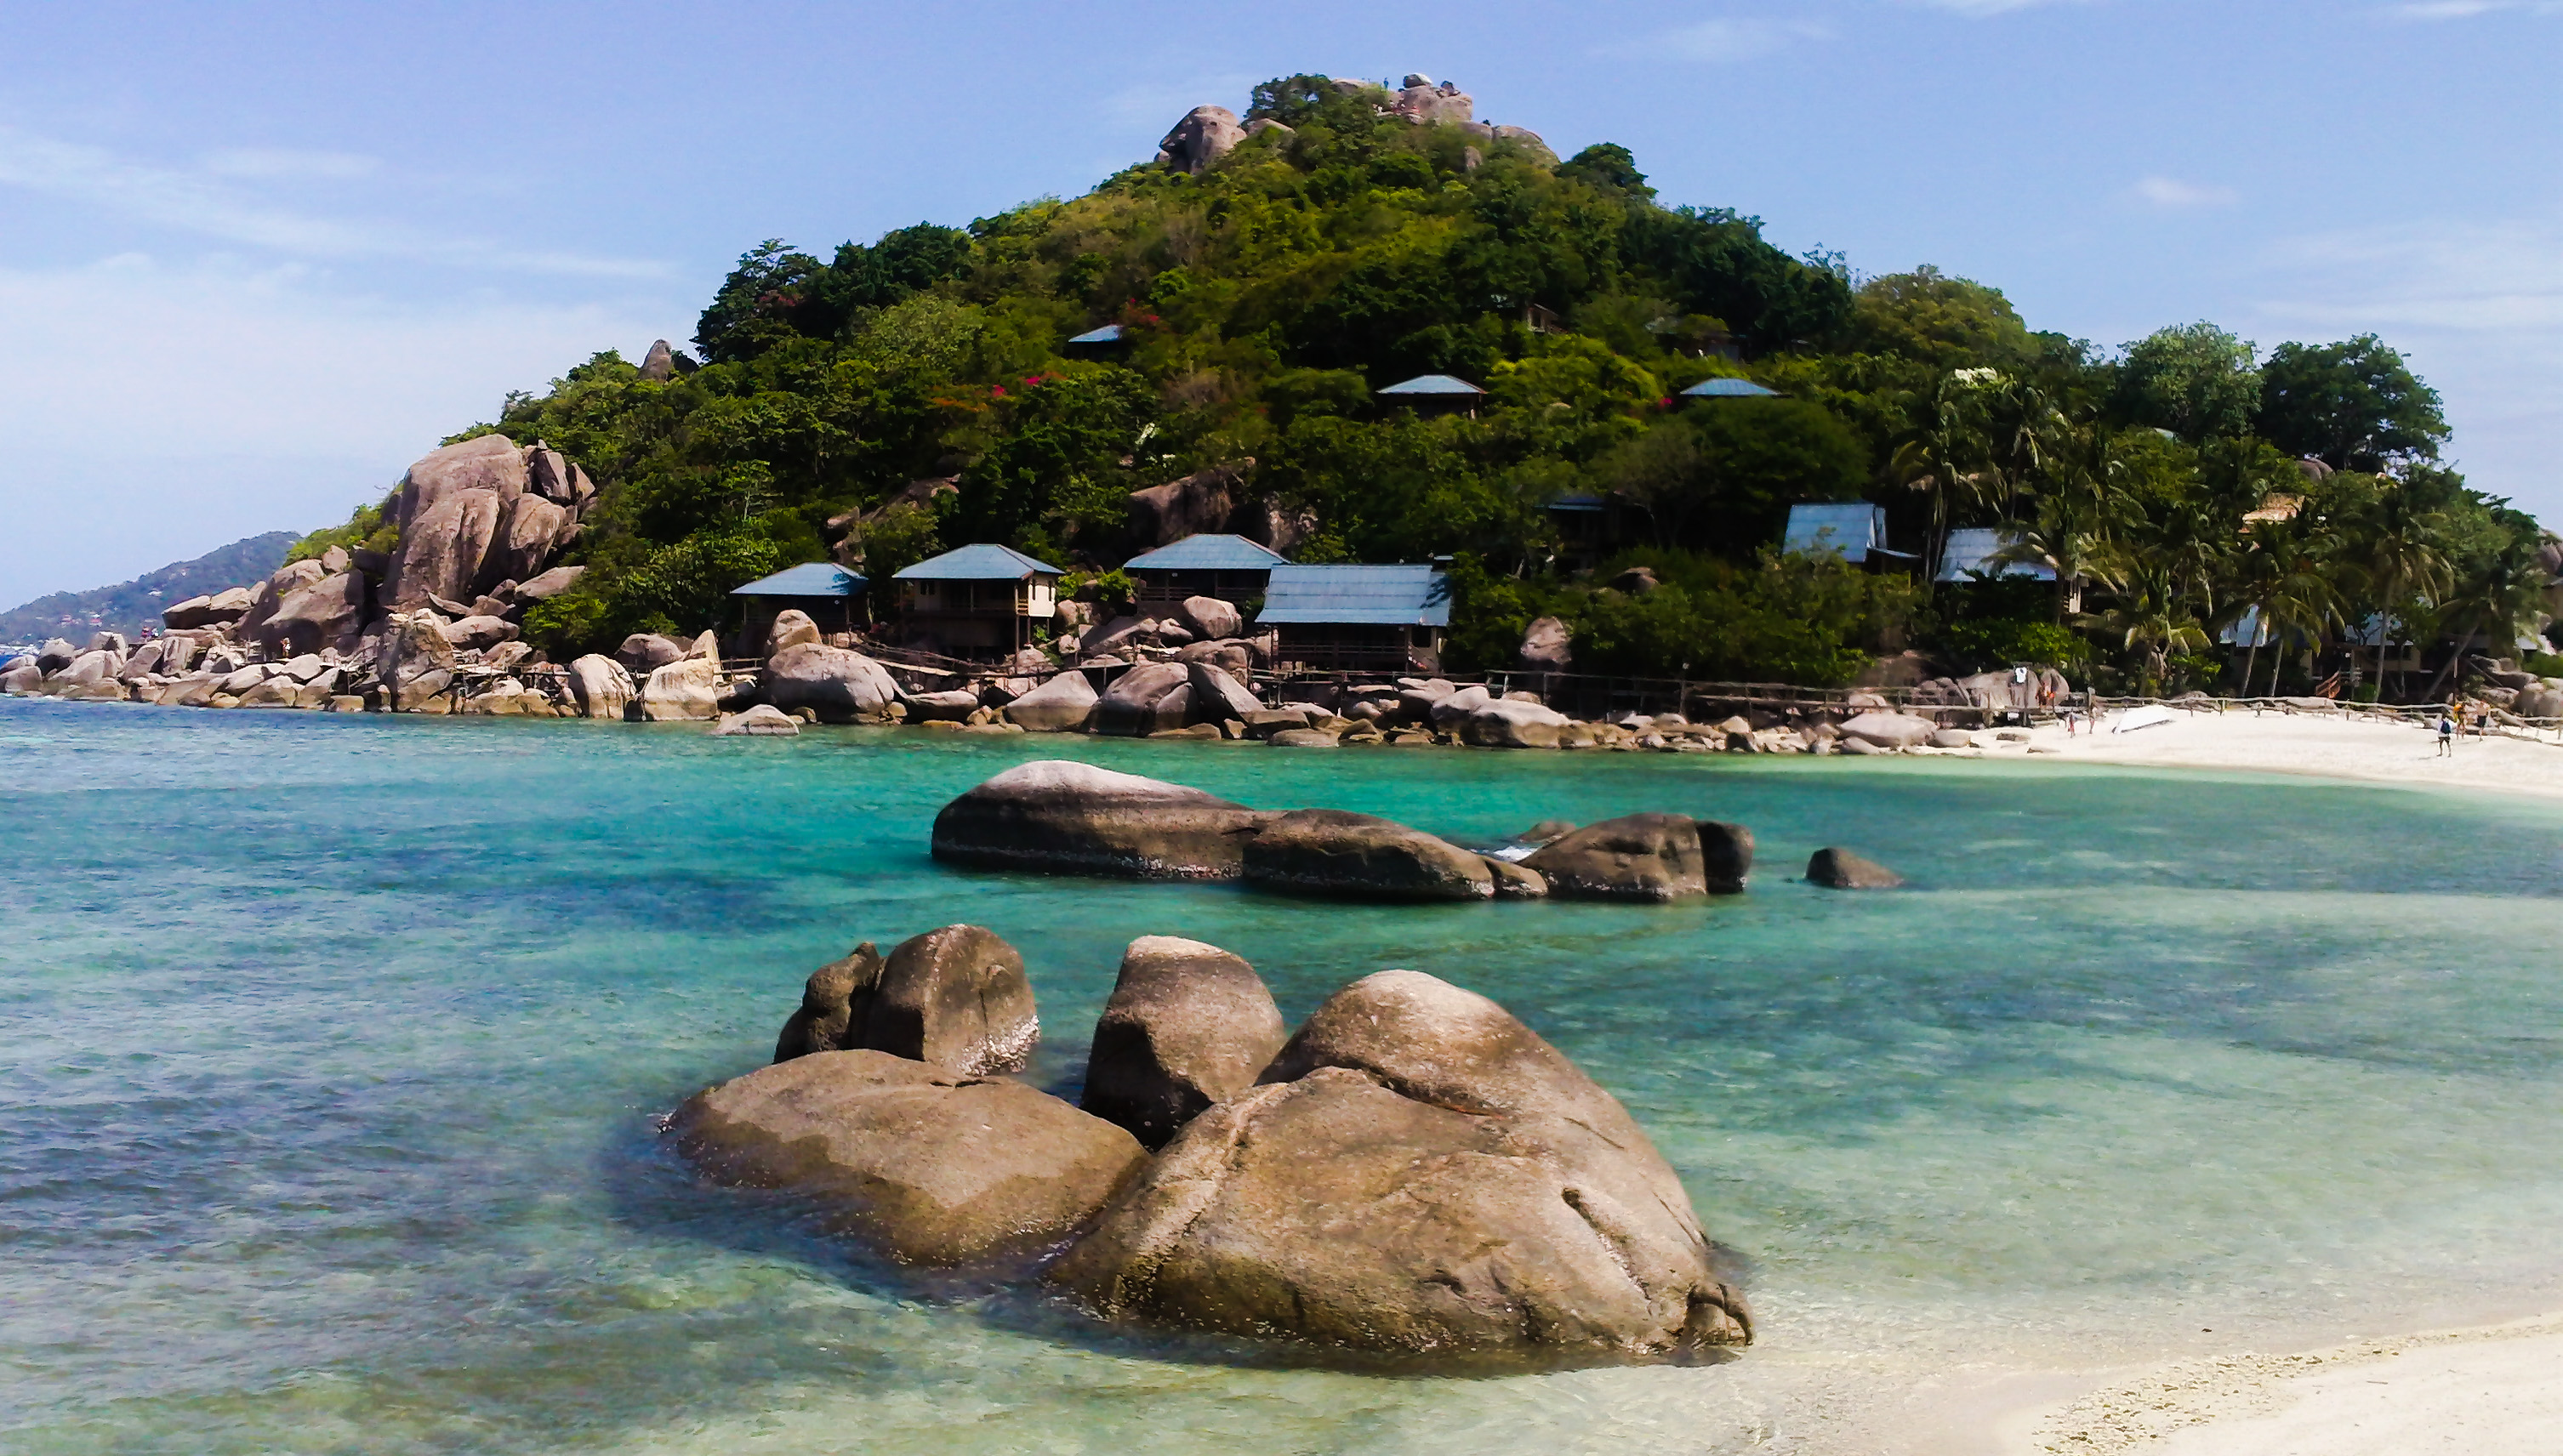 Image de la plage de Koh Nang Yuan